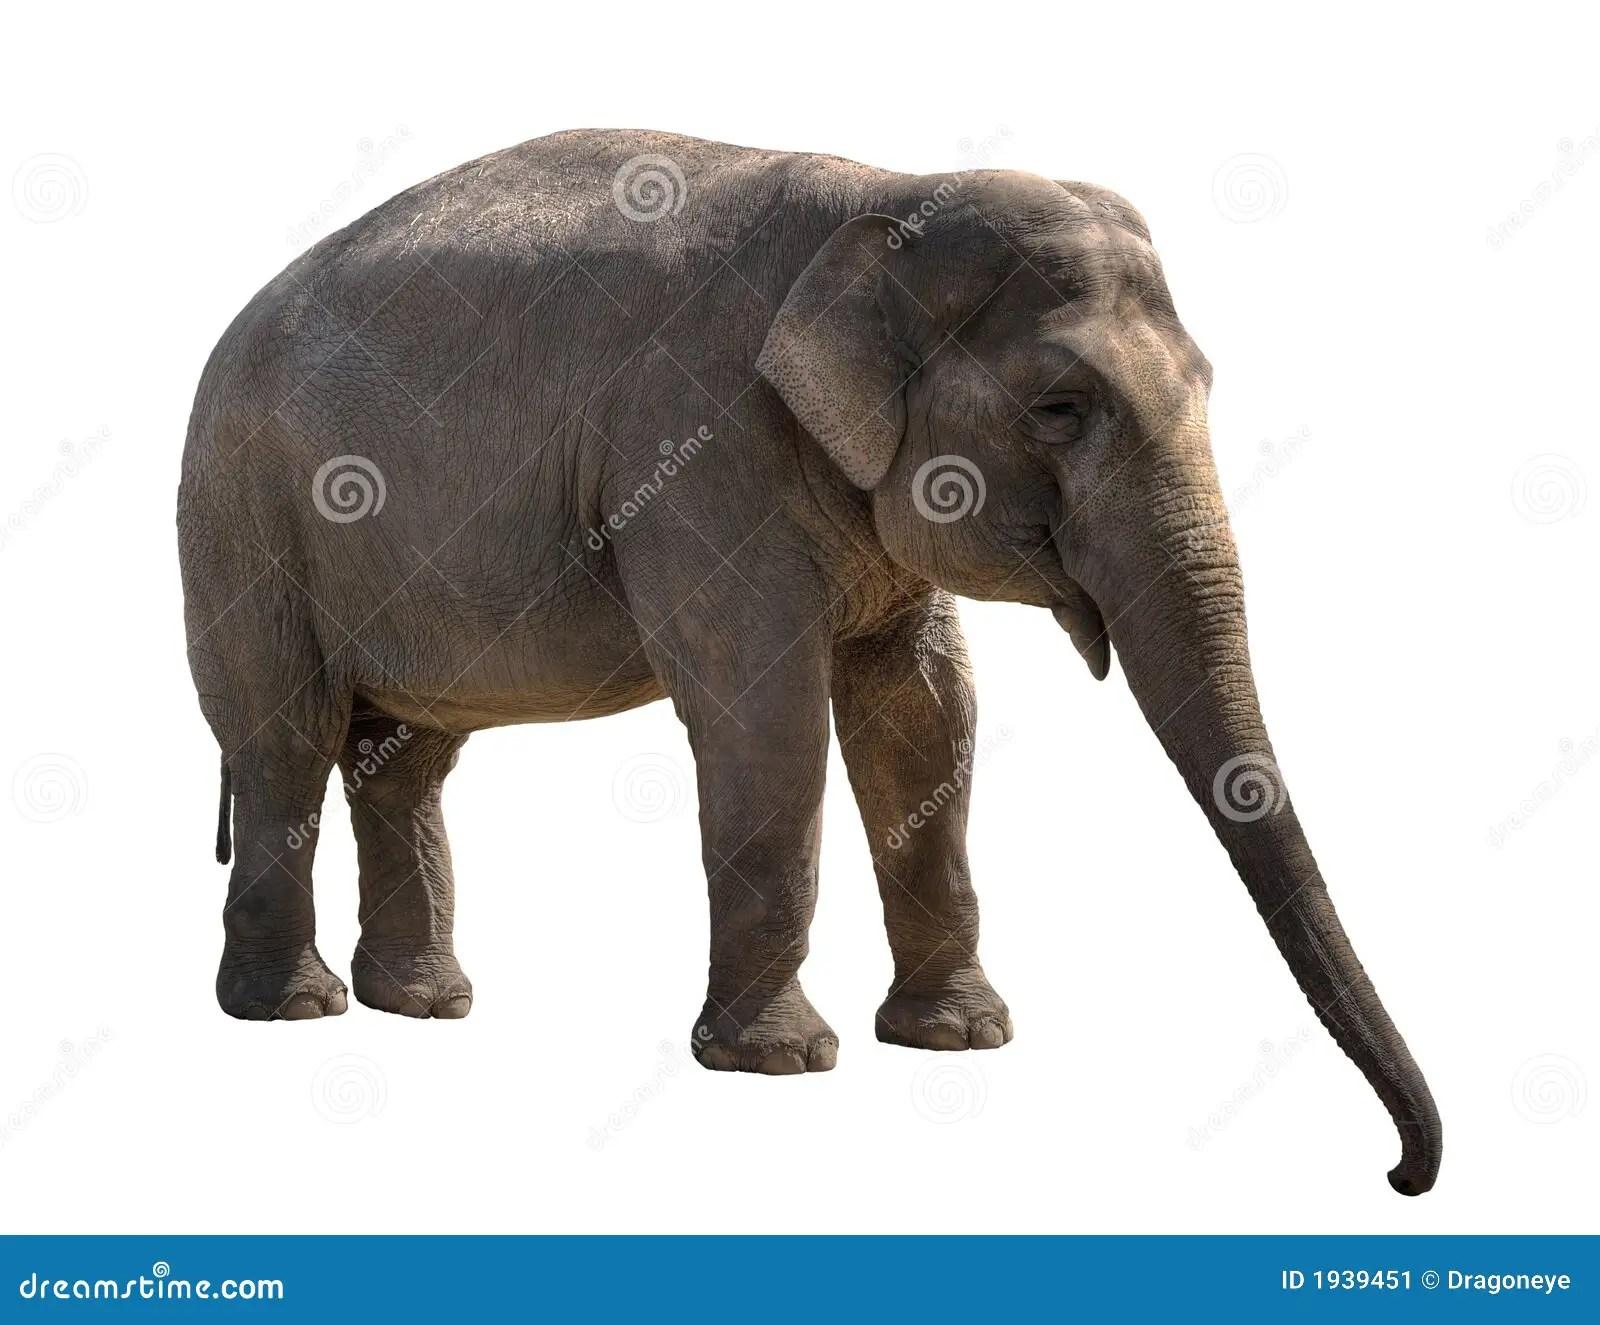 Young Elephant Female Cutout Stock Image